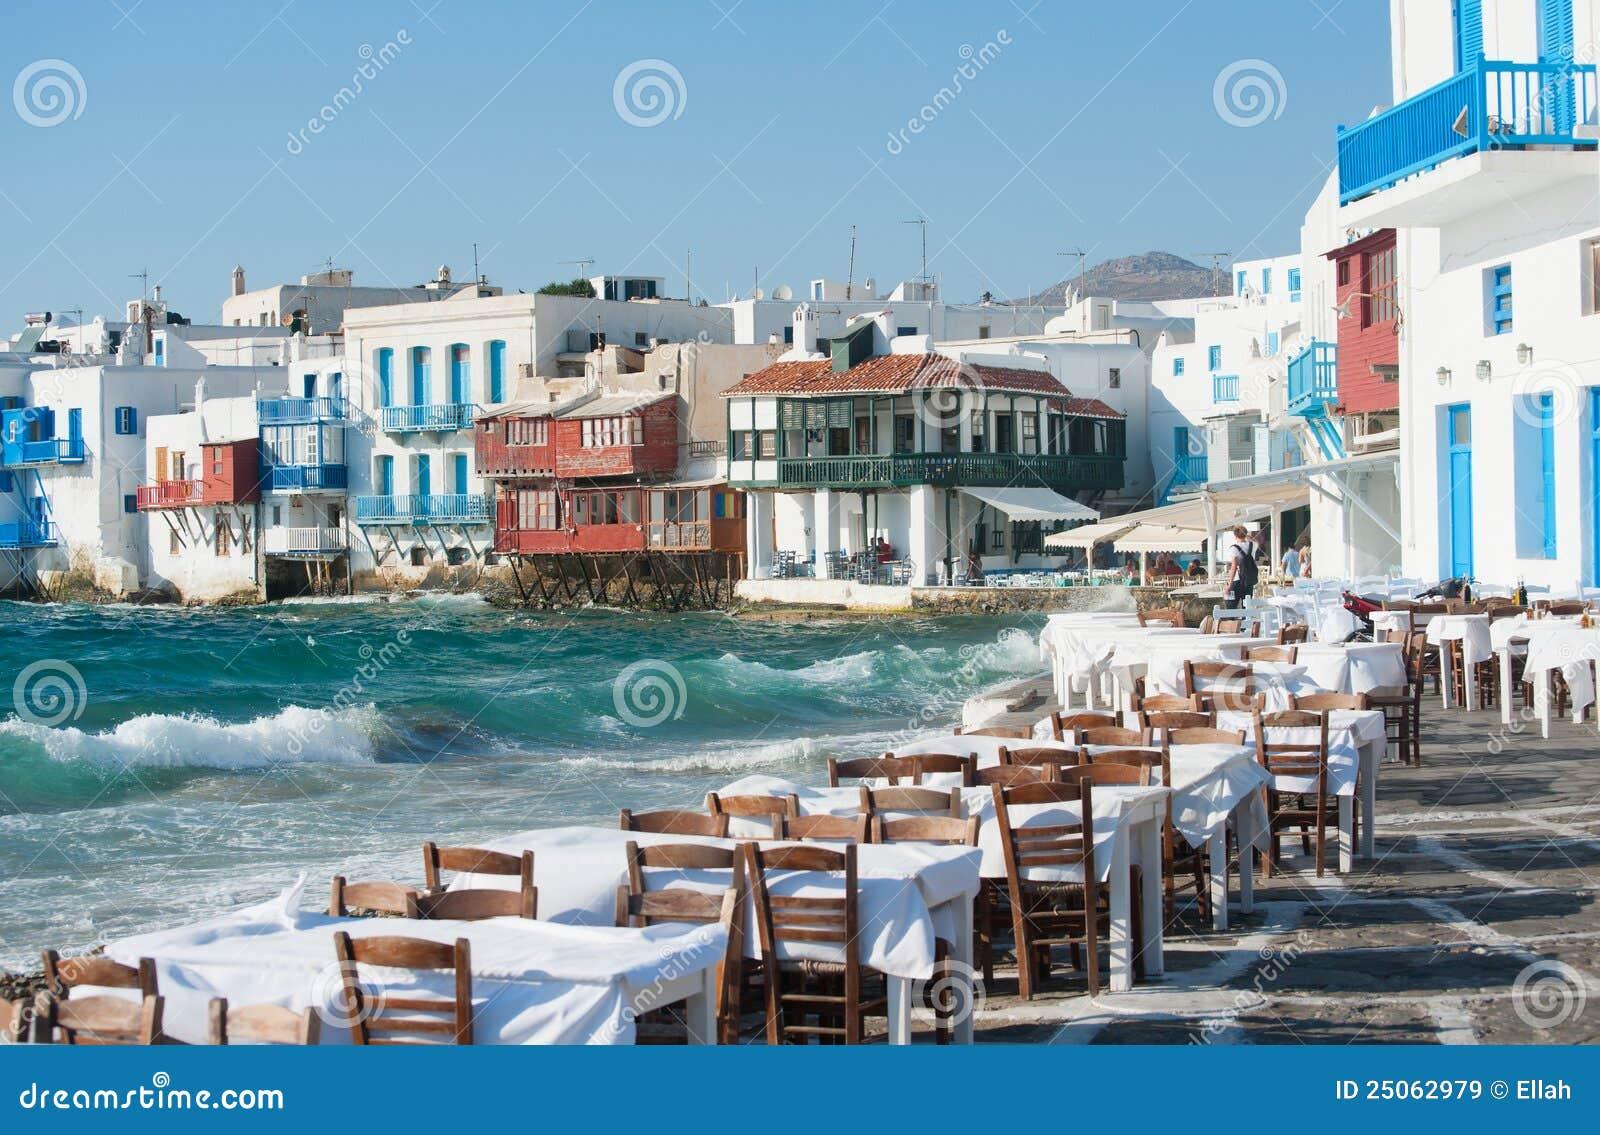 Greek restaurant by the beach